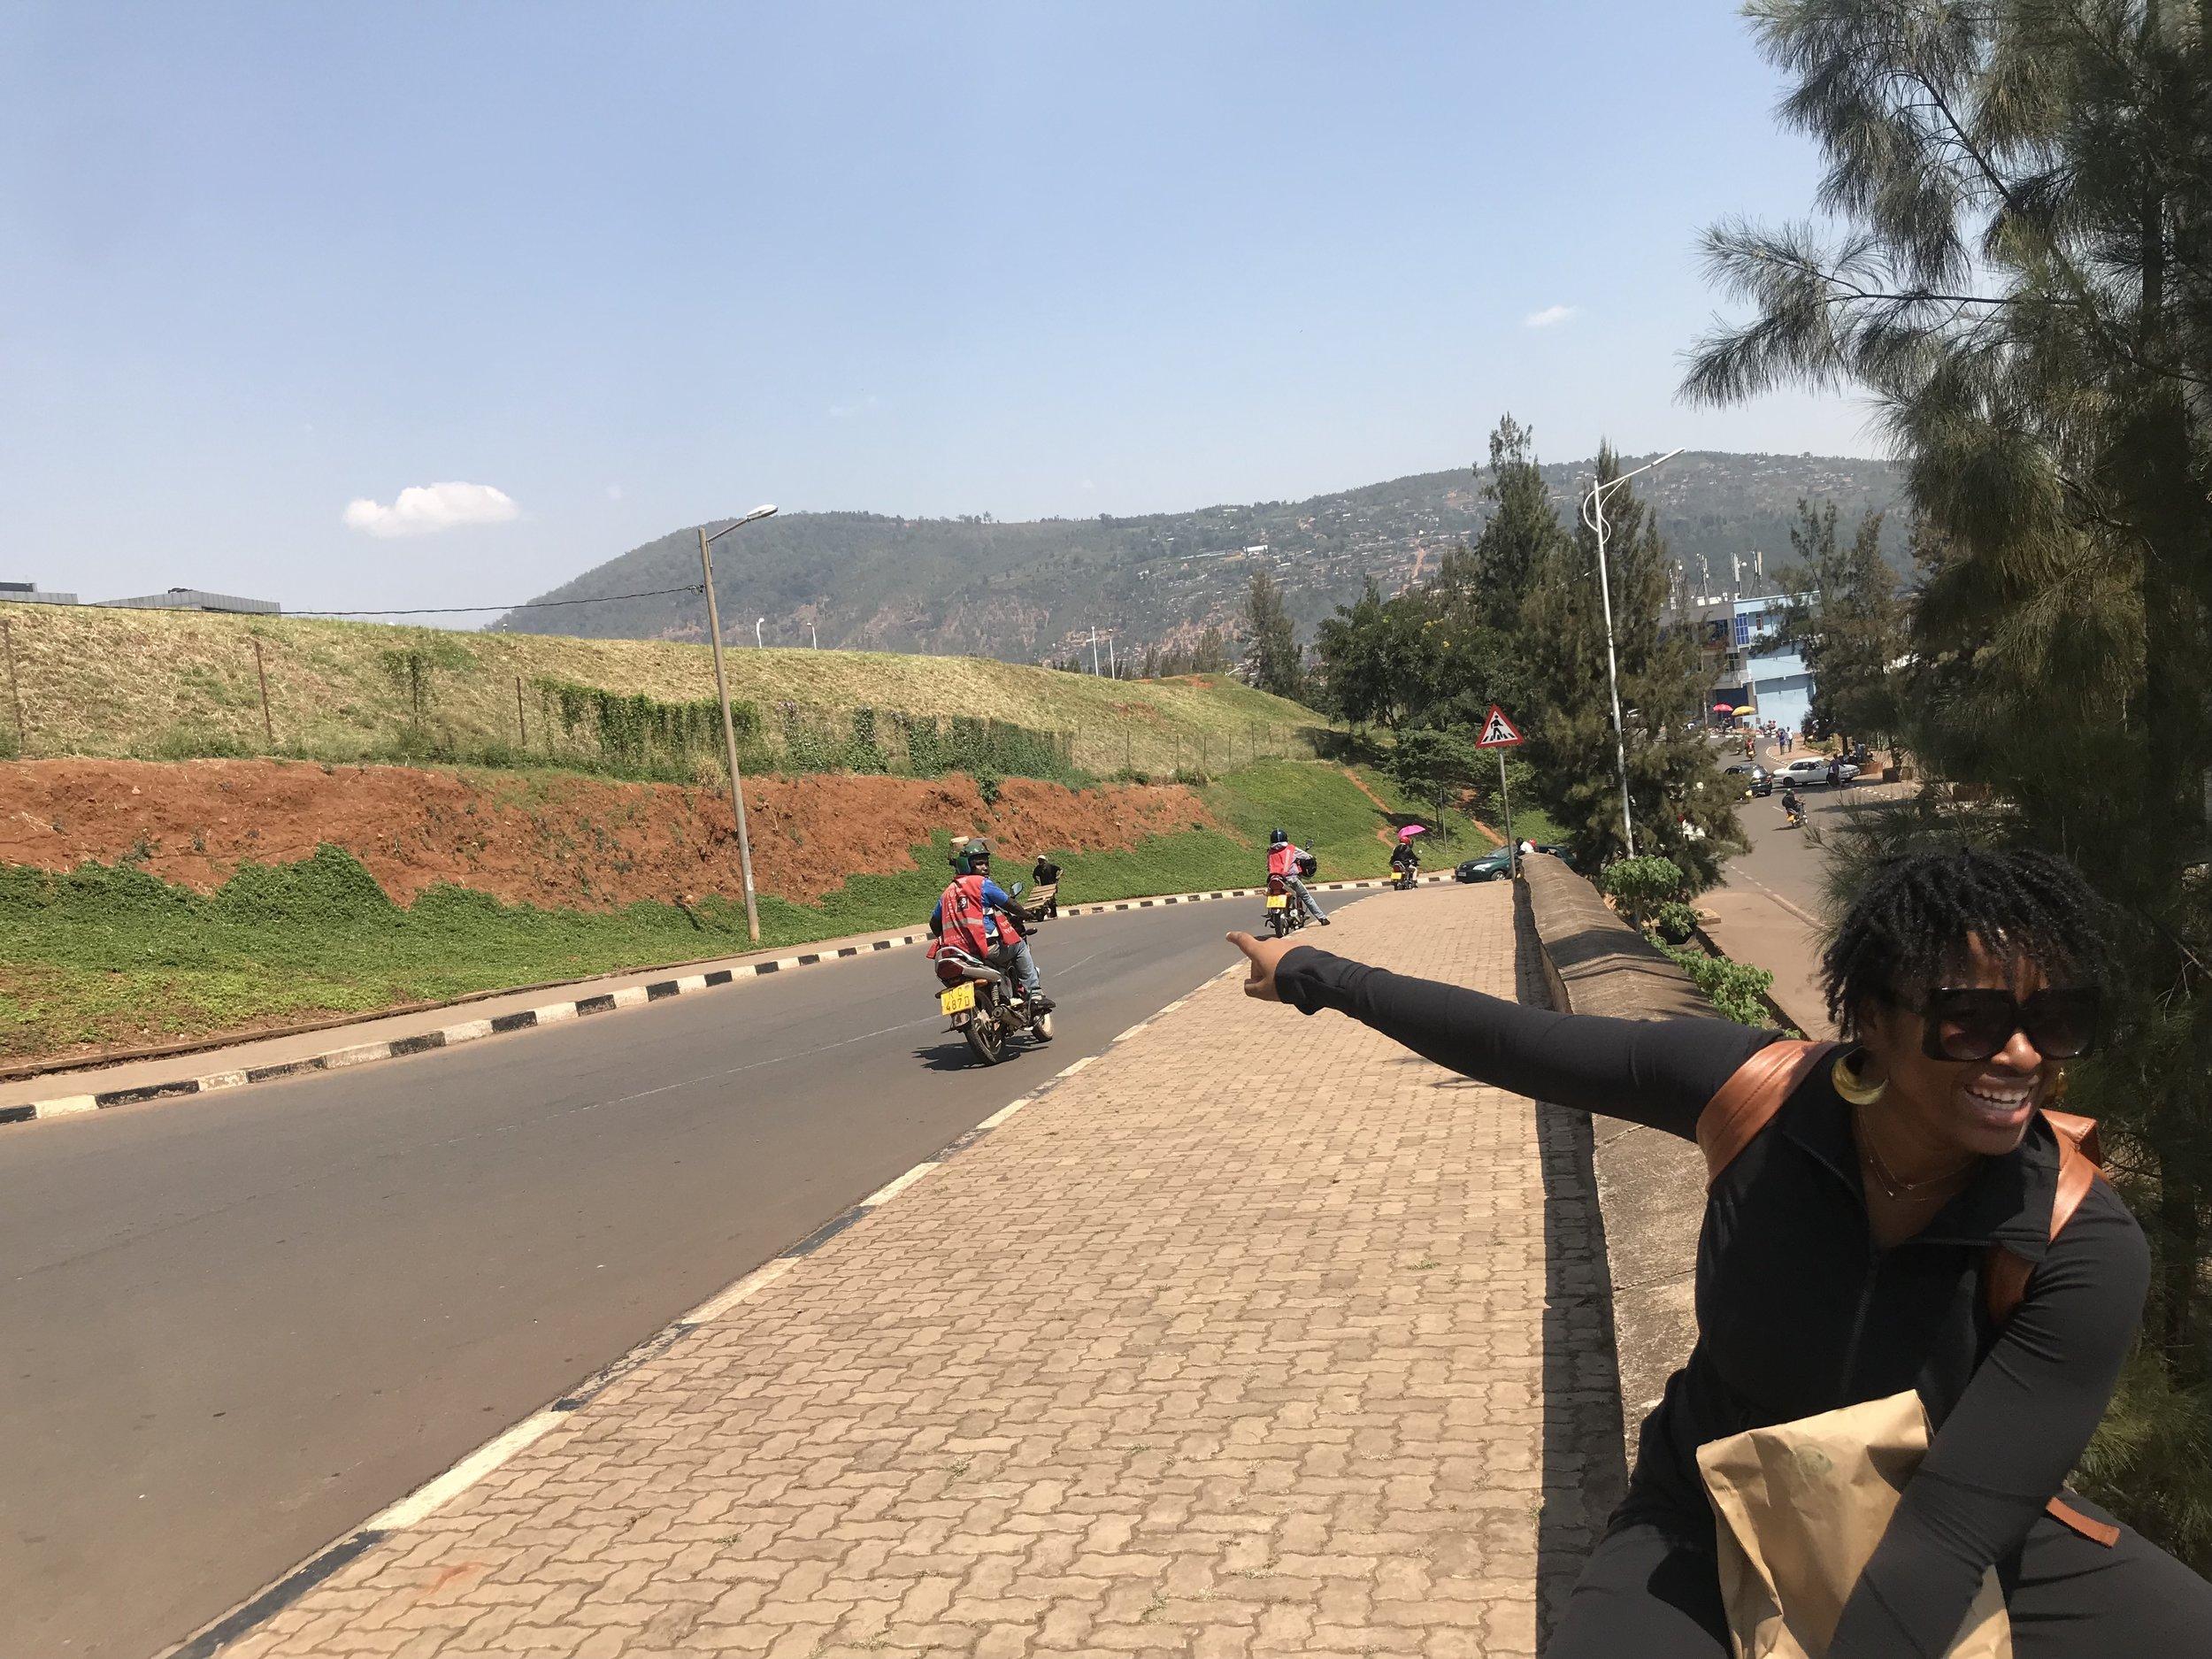 IMG_5638 2VickieRemoe-travel-kigali-rwanda-review-kwibohora25-hotels-africa.JPG